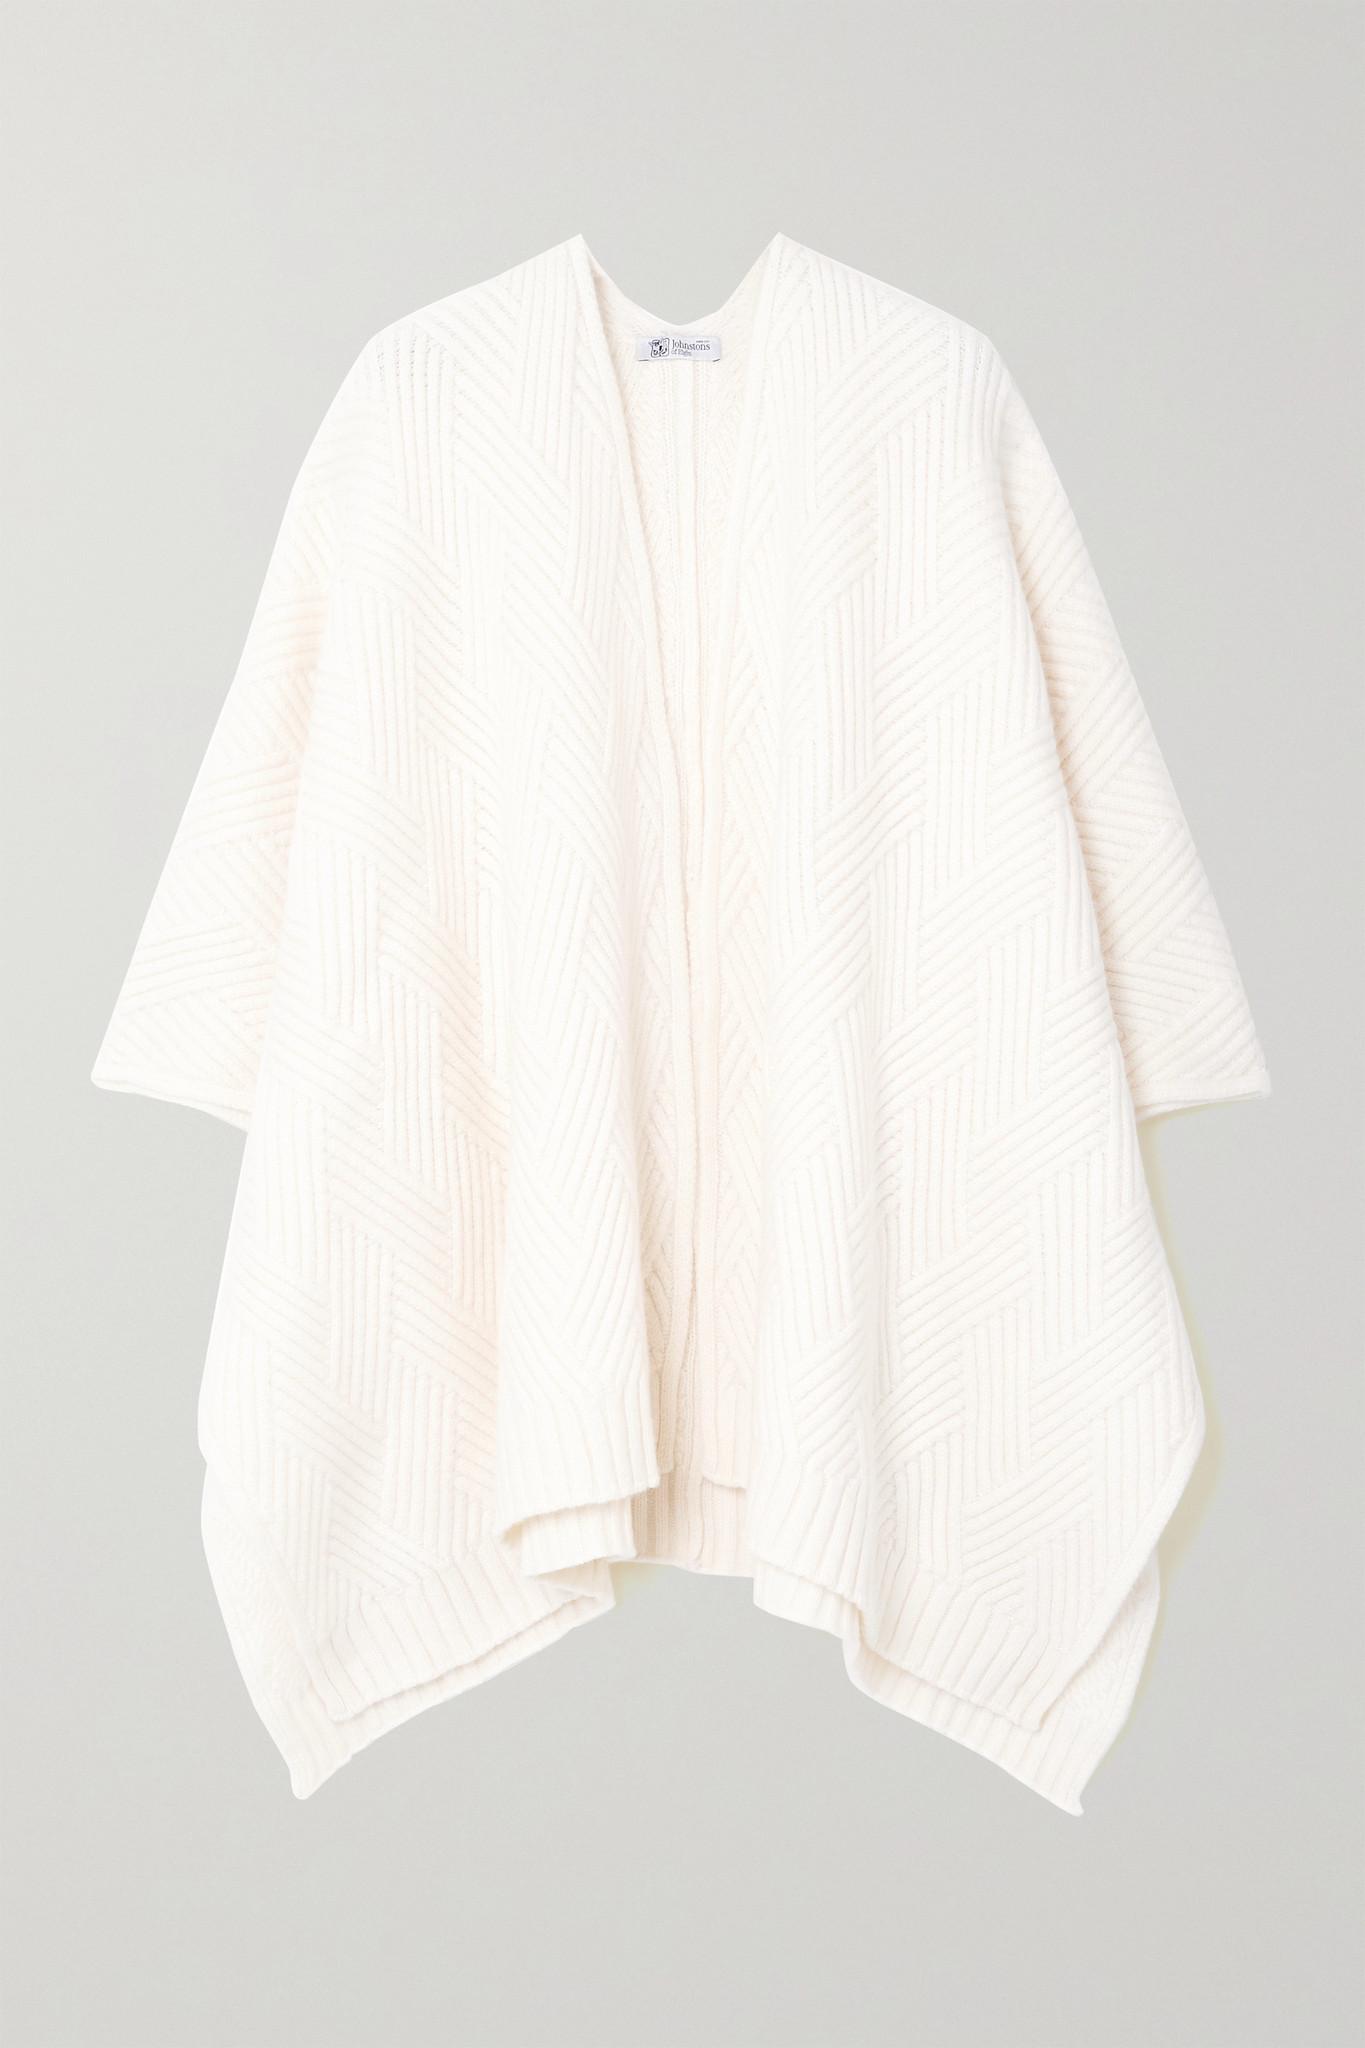 JOHNSTONS OF ELGIN - 【net Sustain】hanna 罗纹羊绒裹身围巾 - 白色 - One size